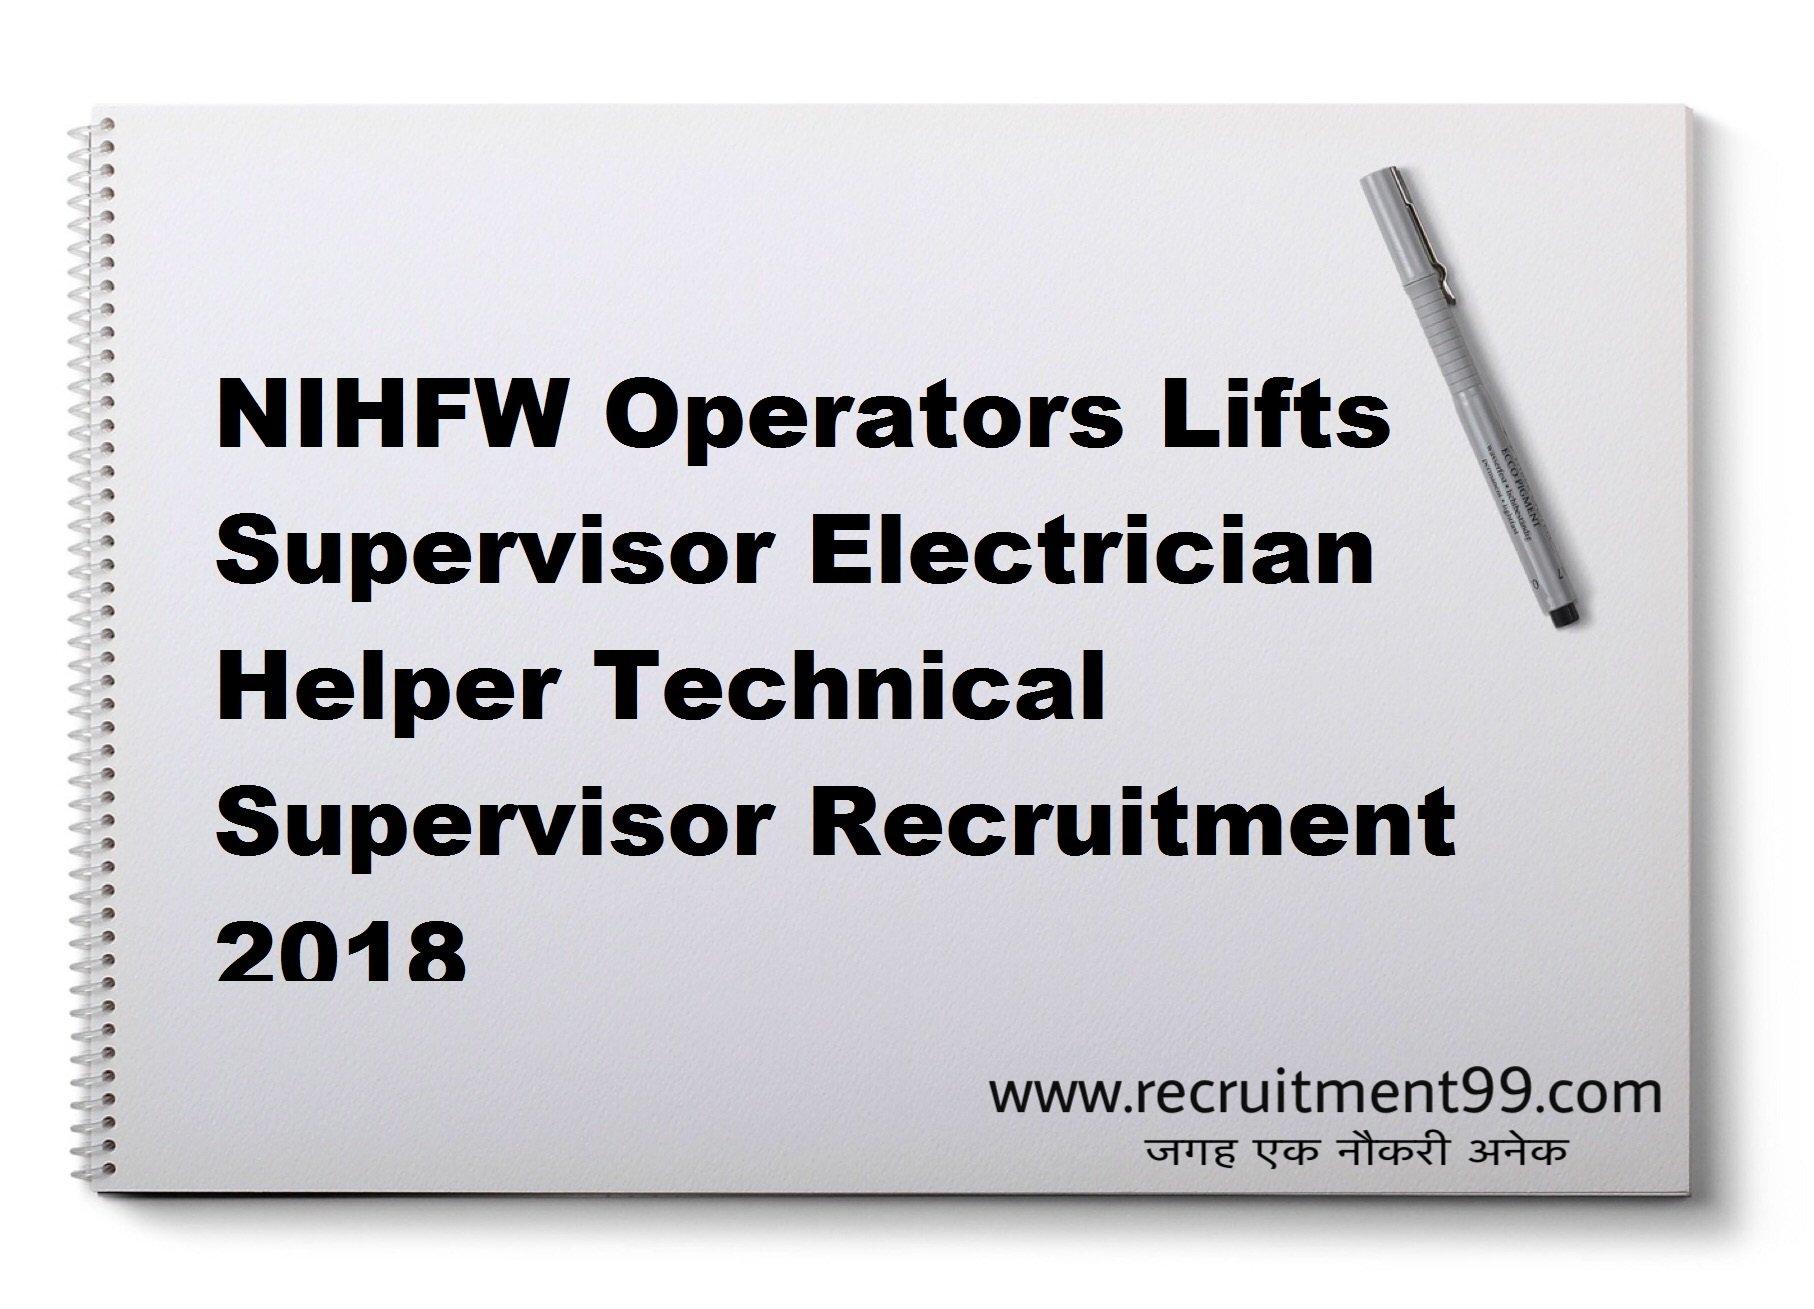 NIHFW Operators Lifts Supervisor Electrician Helper Technical Supervisor Recruitment Admit Card Result 2018